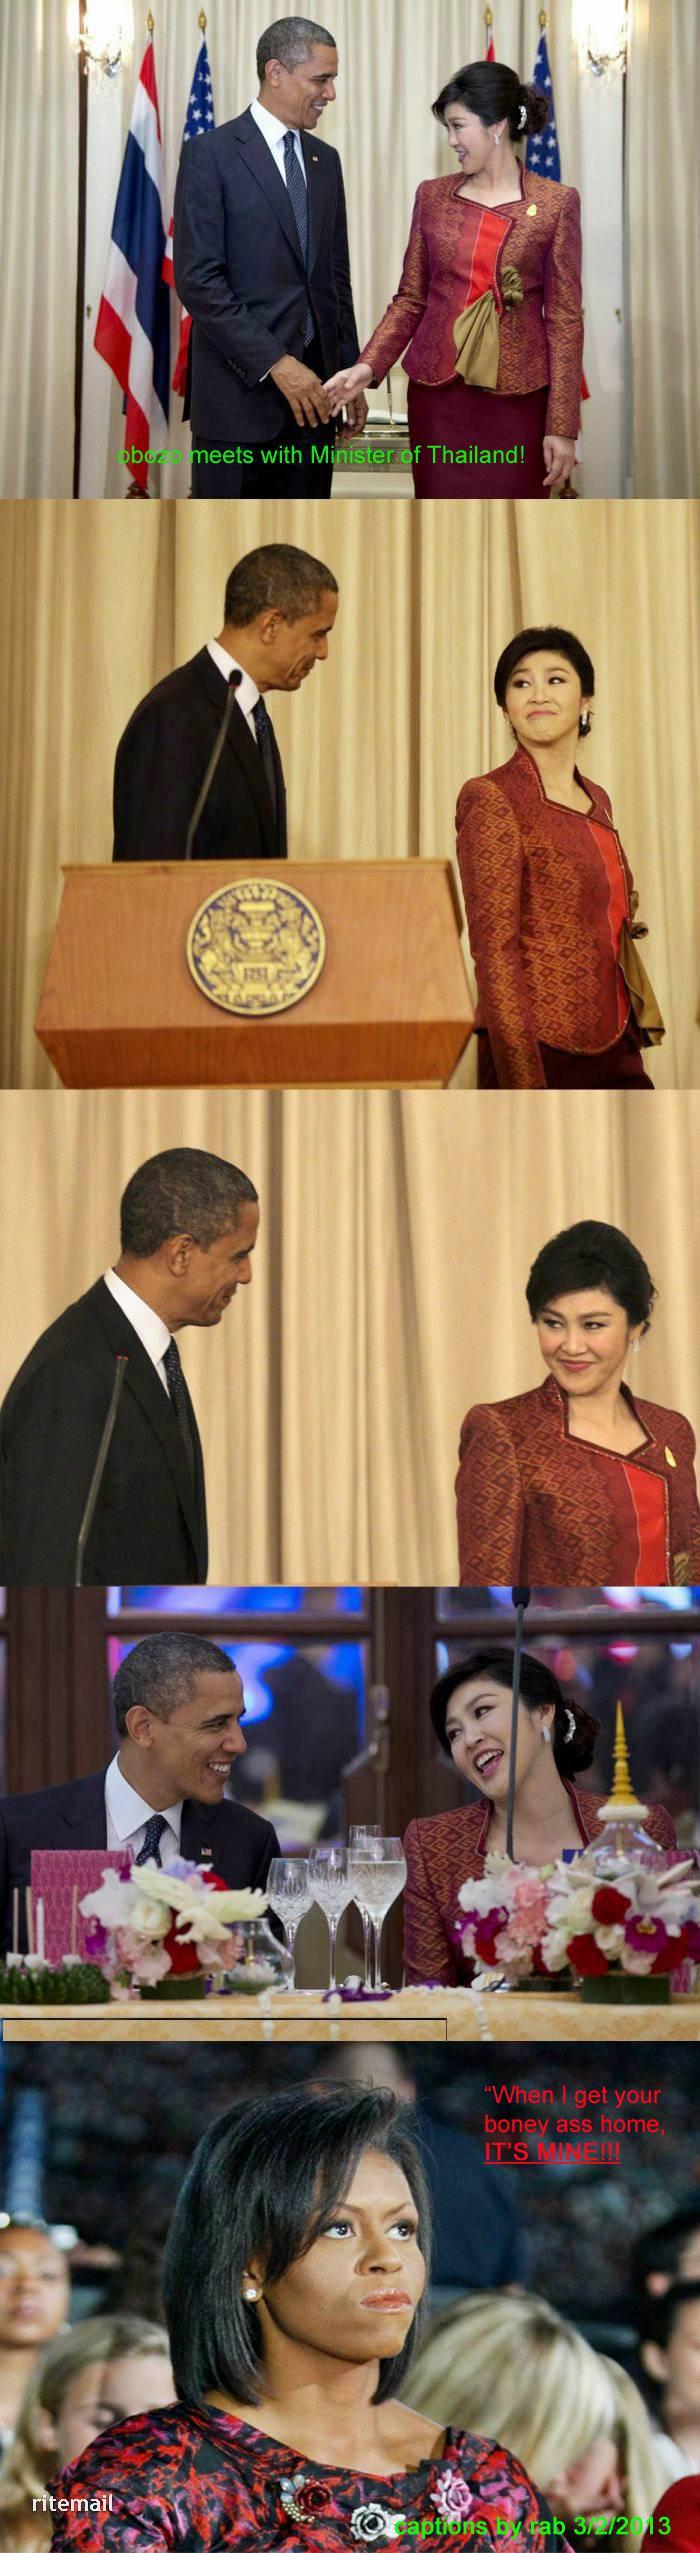 Obama meets PM